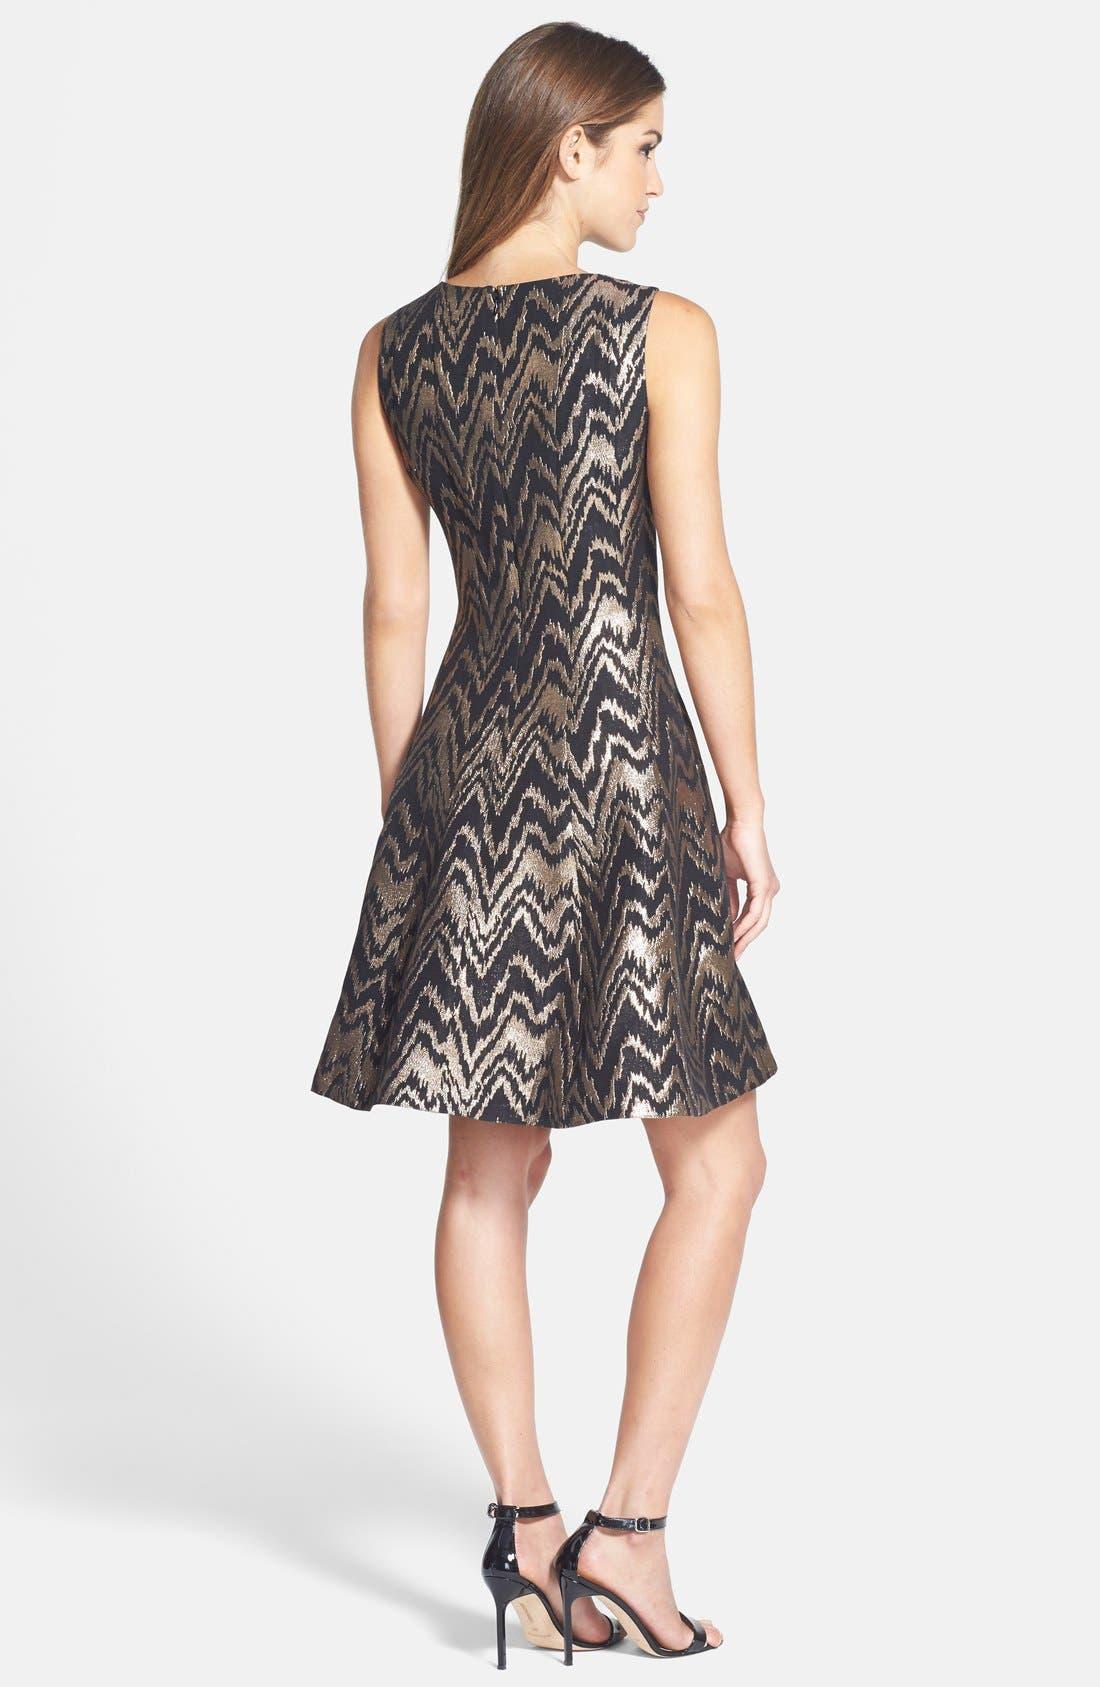 VINCE CAMUTO,                             Metallic Jacquard Fit & Flare Dress,                             Alternate thumbnail 4, color,                             226